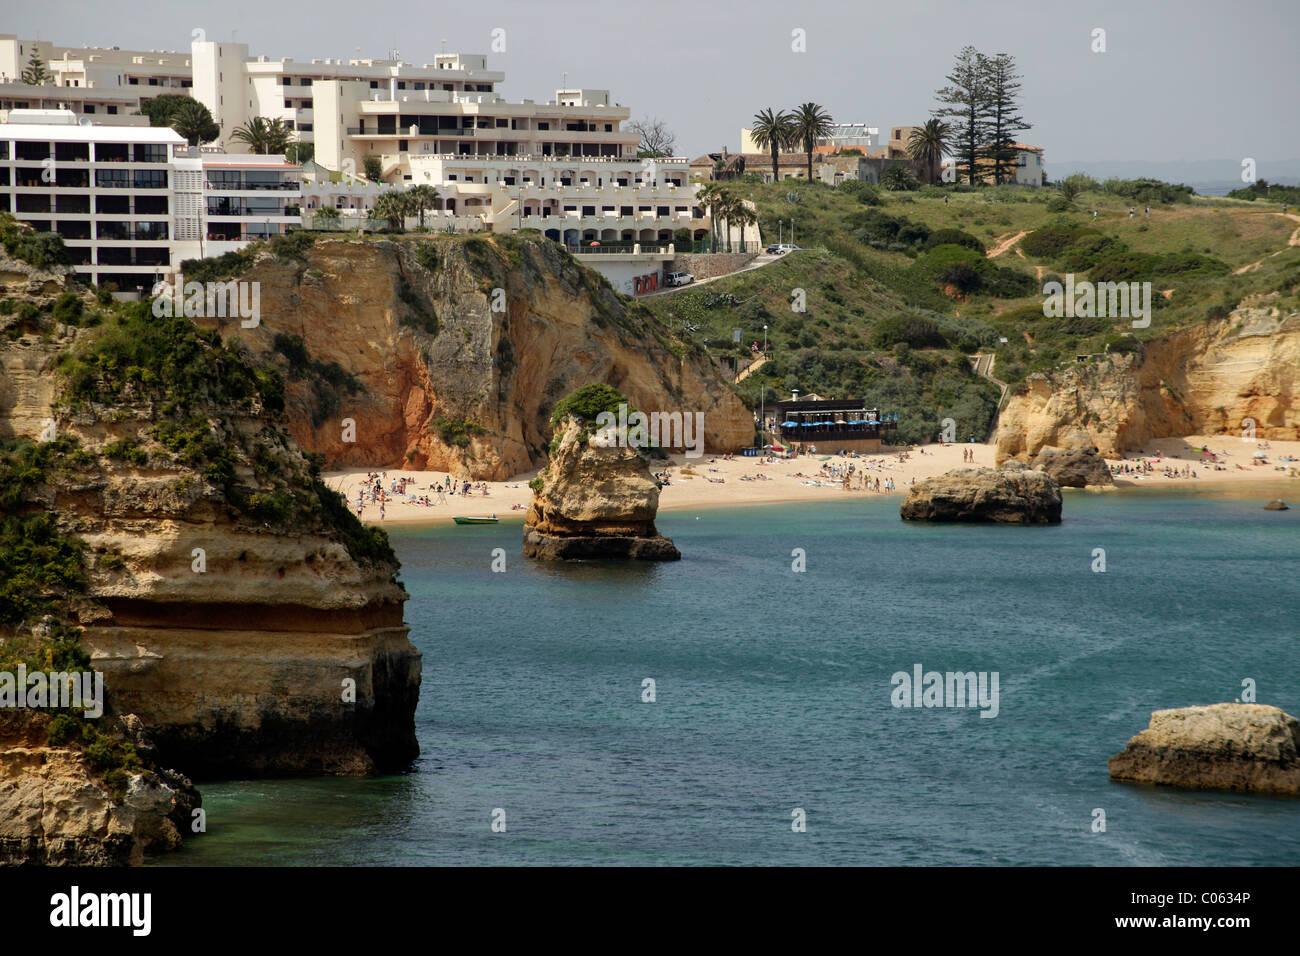 Hotel facilities at the beach Praia Dona Ana in Lagos, Algarve, Portugal, Europe - Stock Image